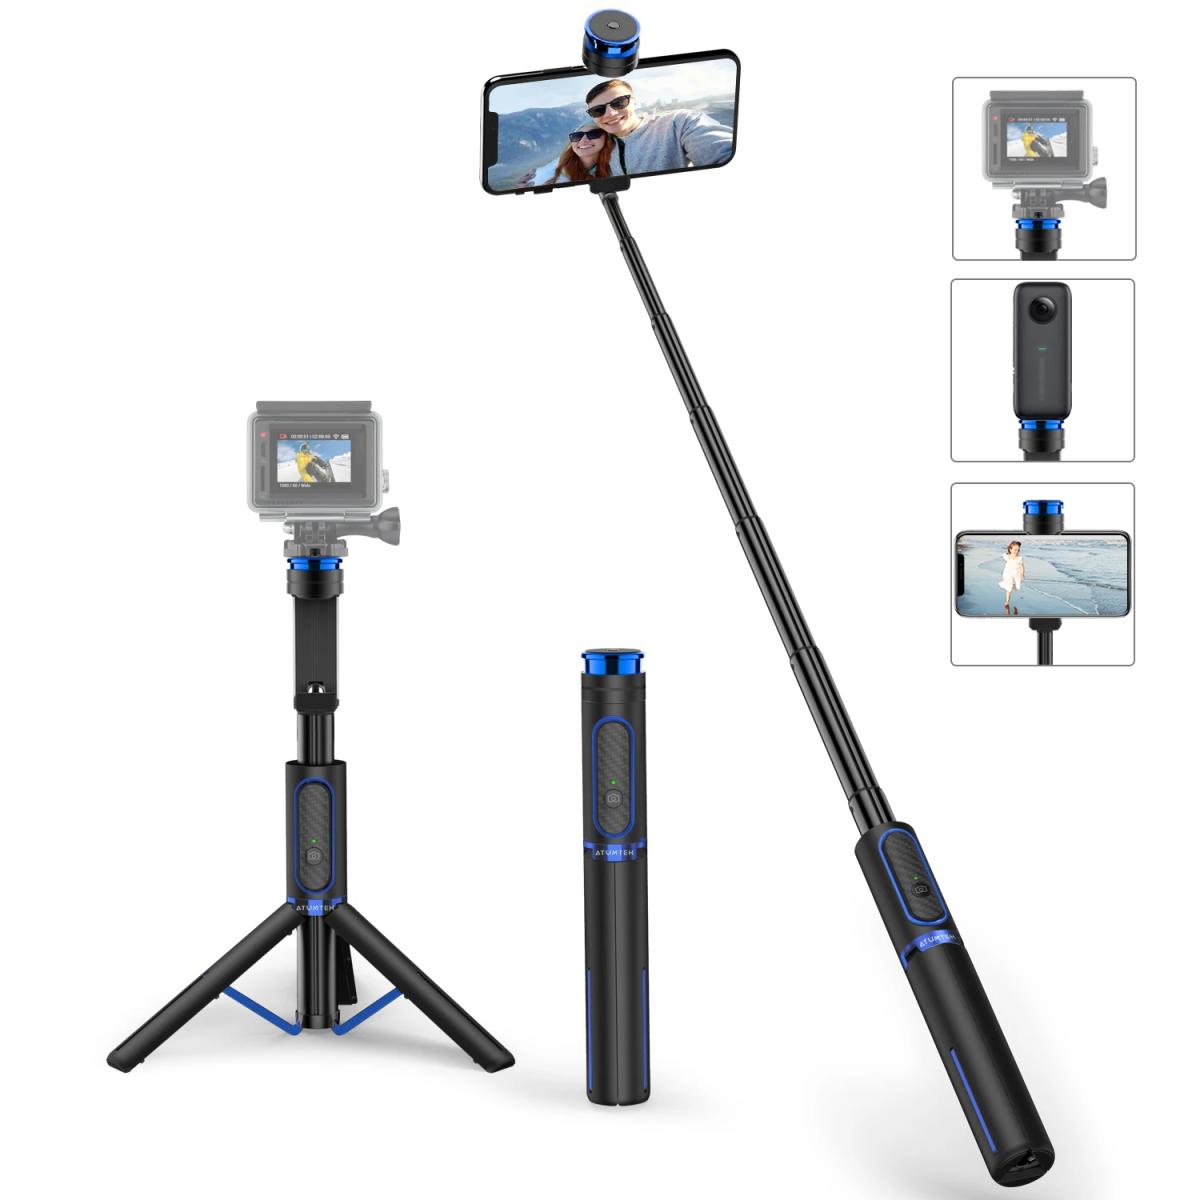 atumtek-4-in-1-bluetooth-selfie-stick-tripod-review